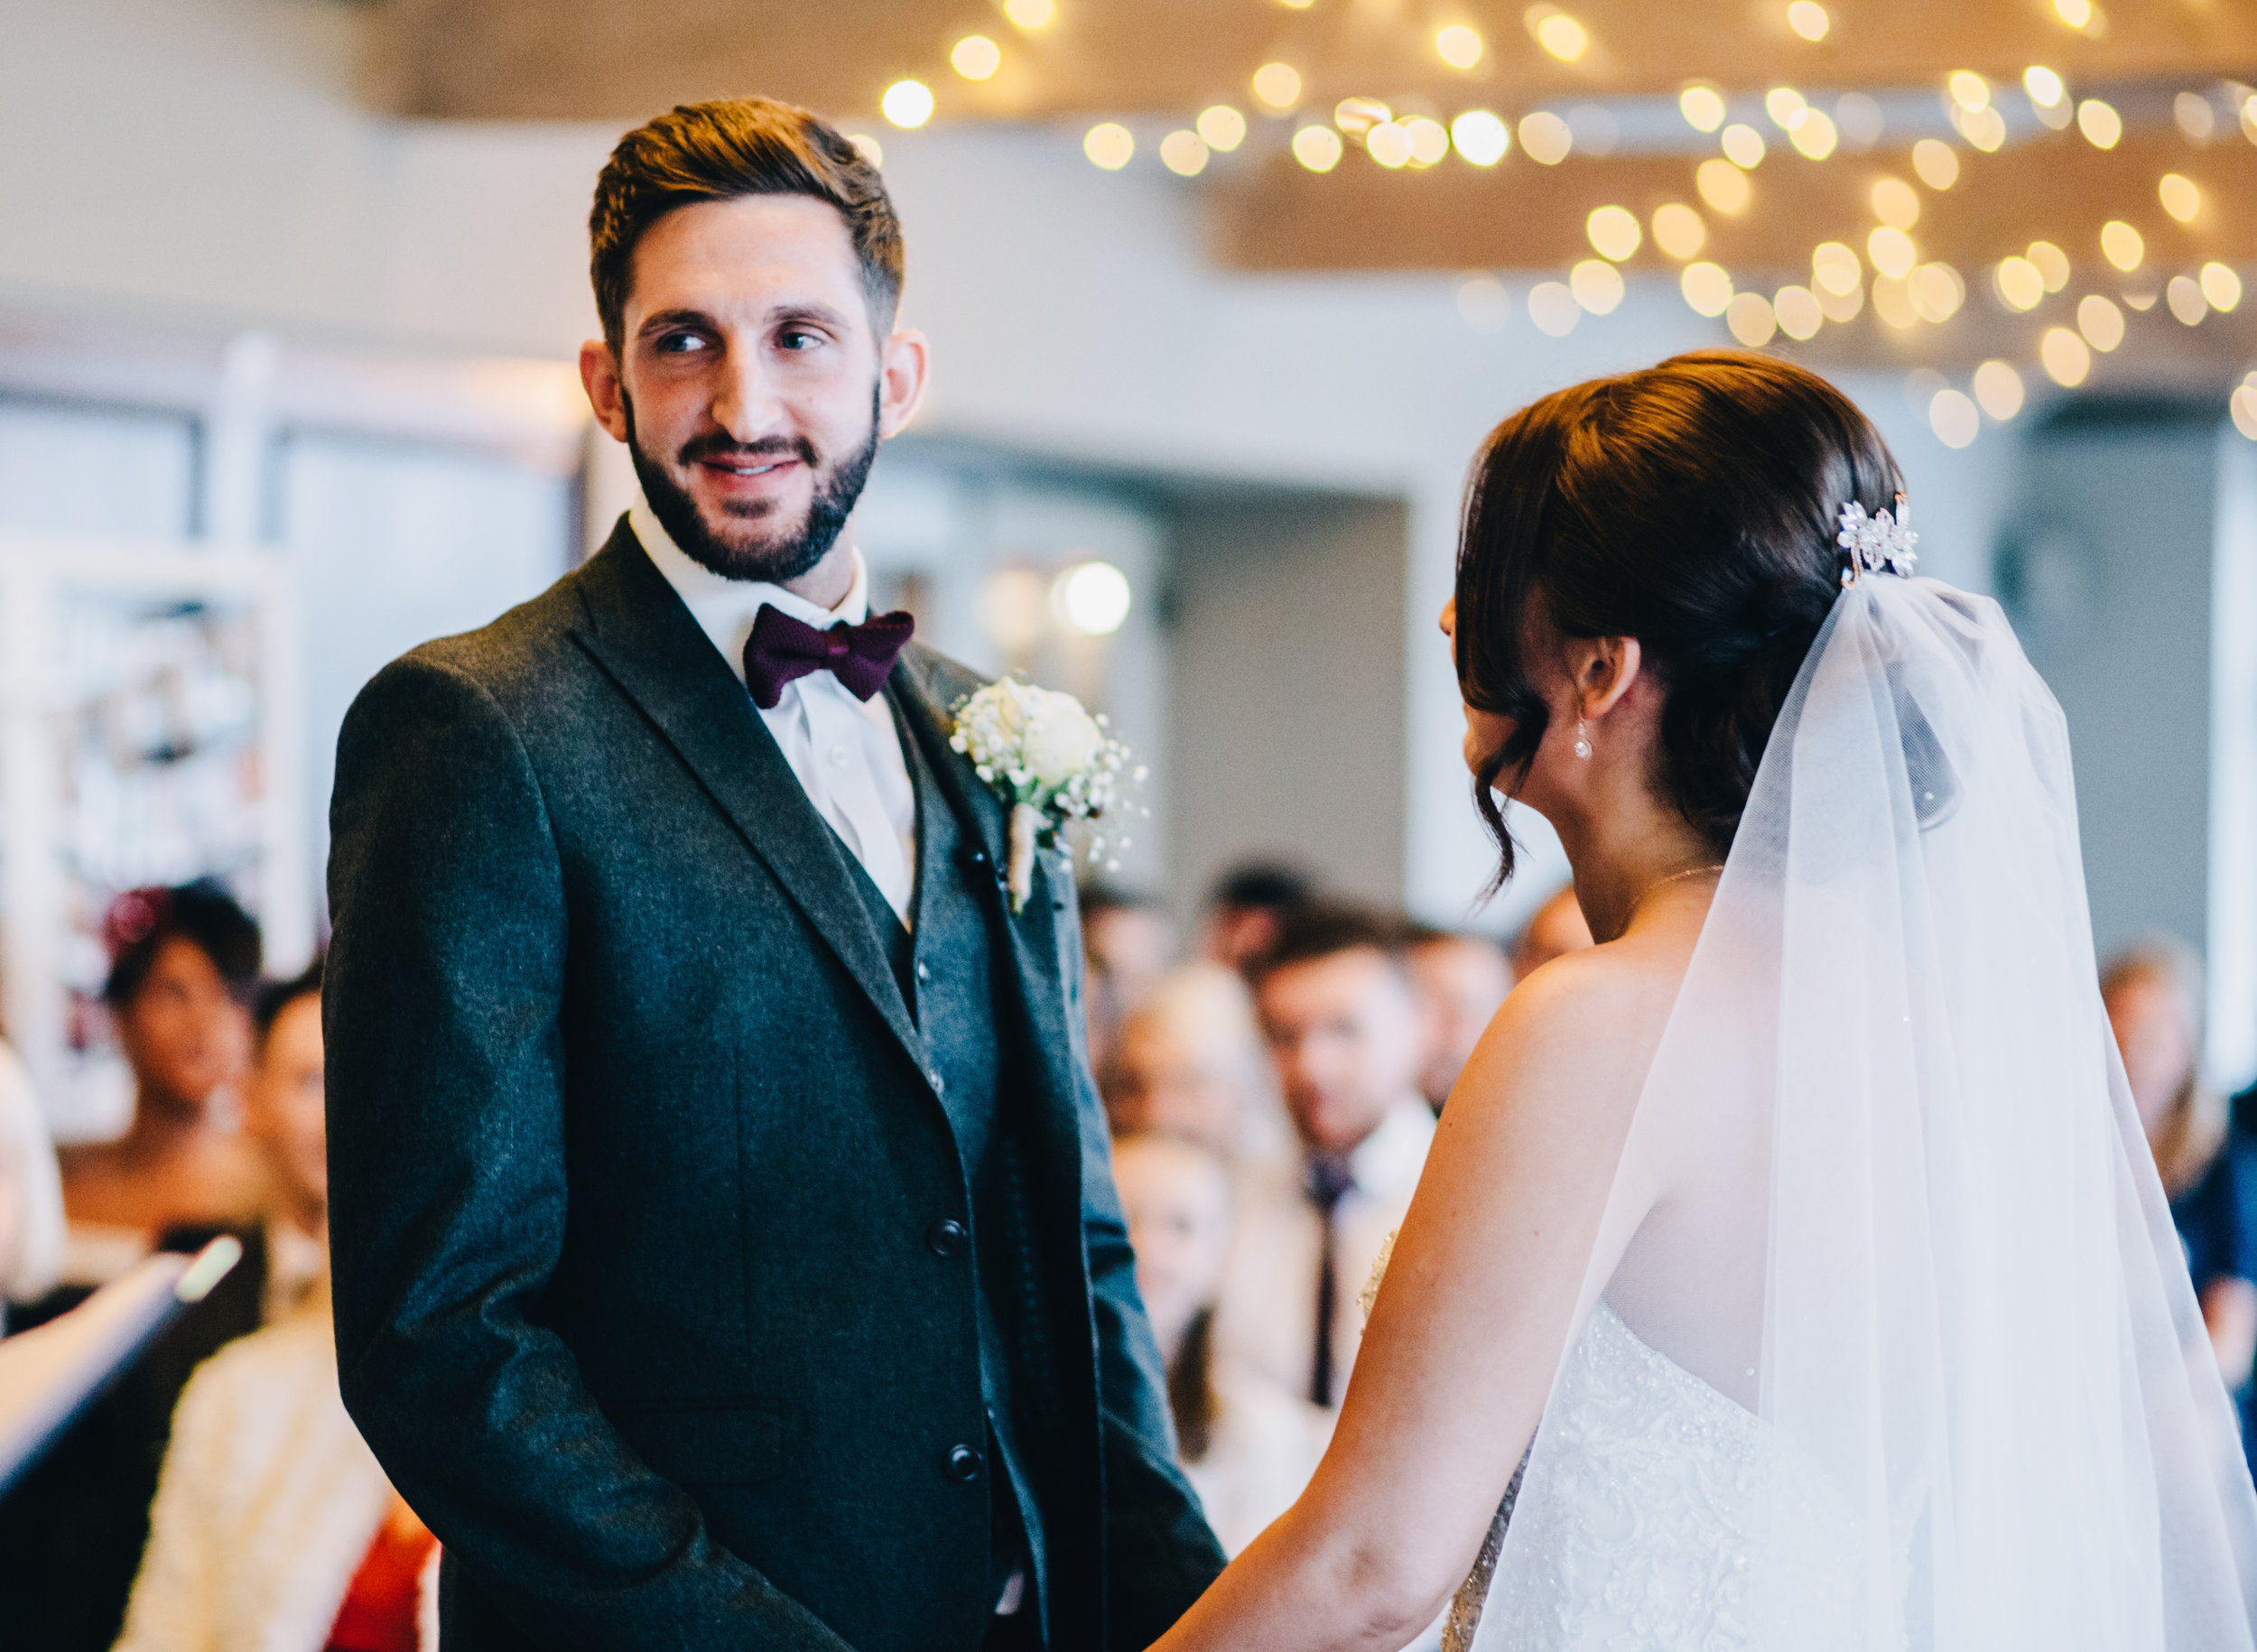 Smiling groom - Lancashire wedding photographer